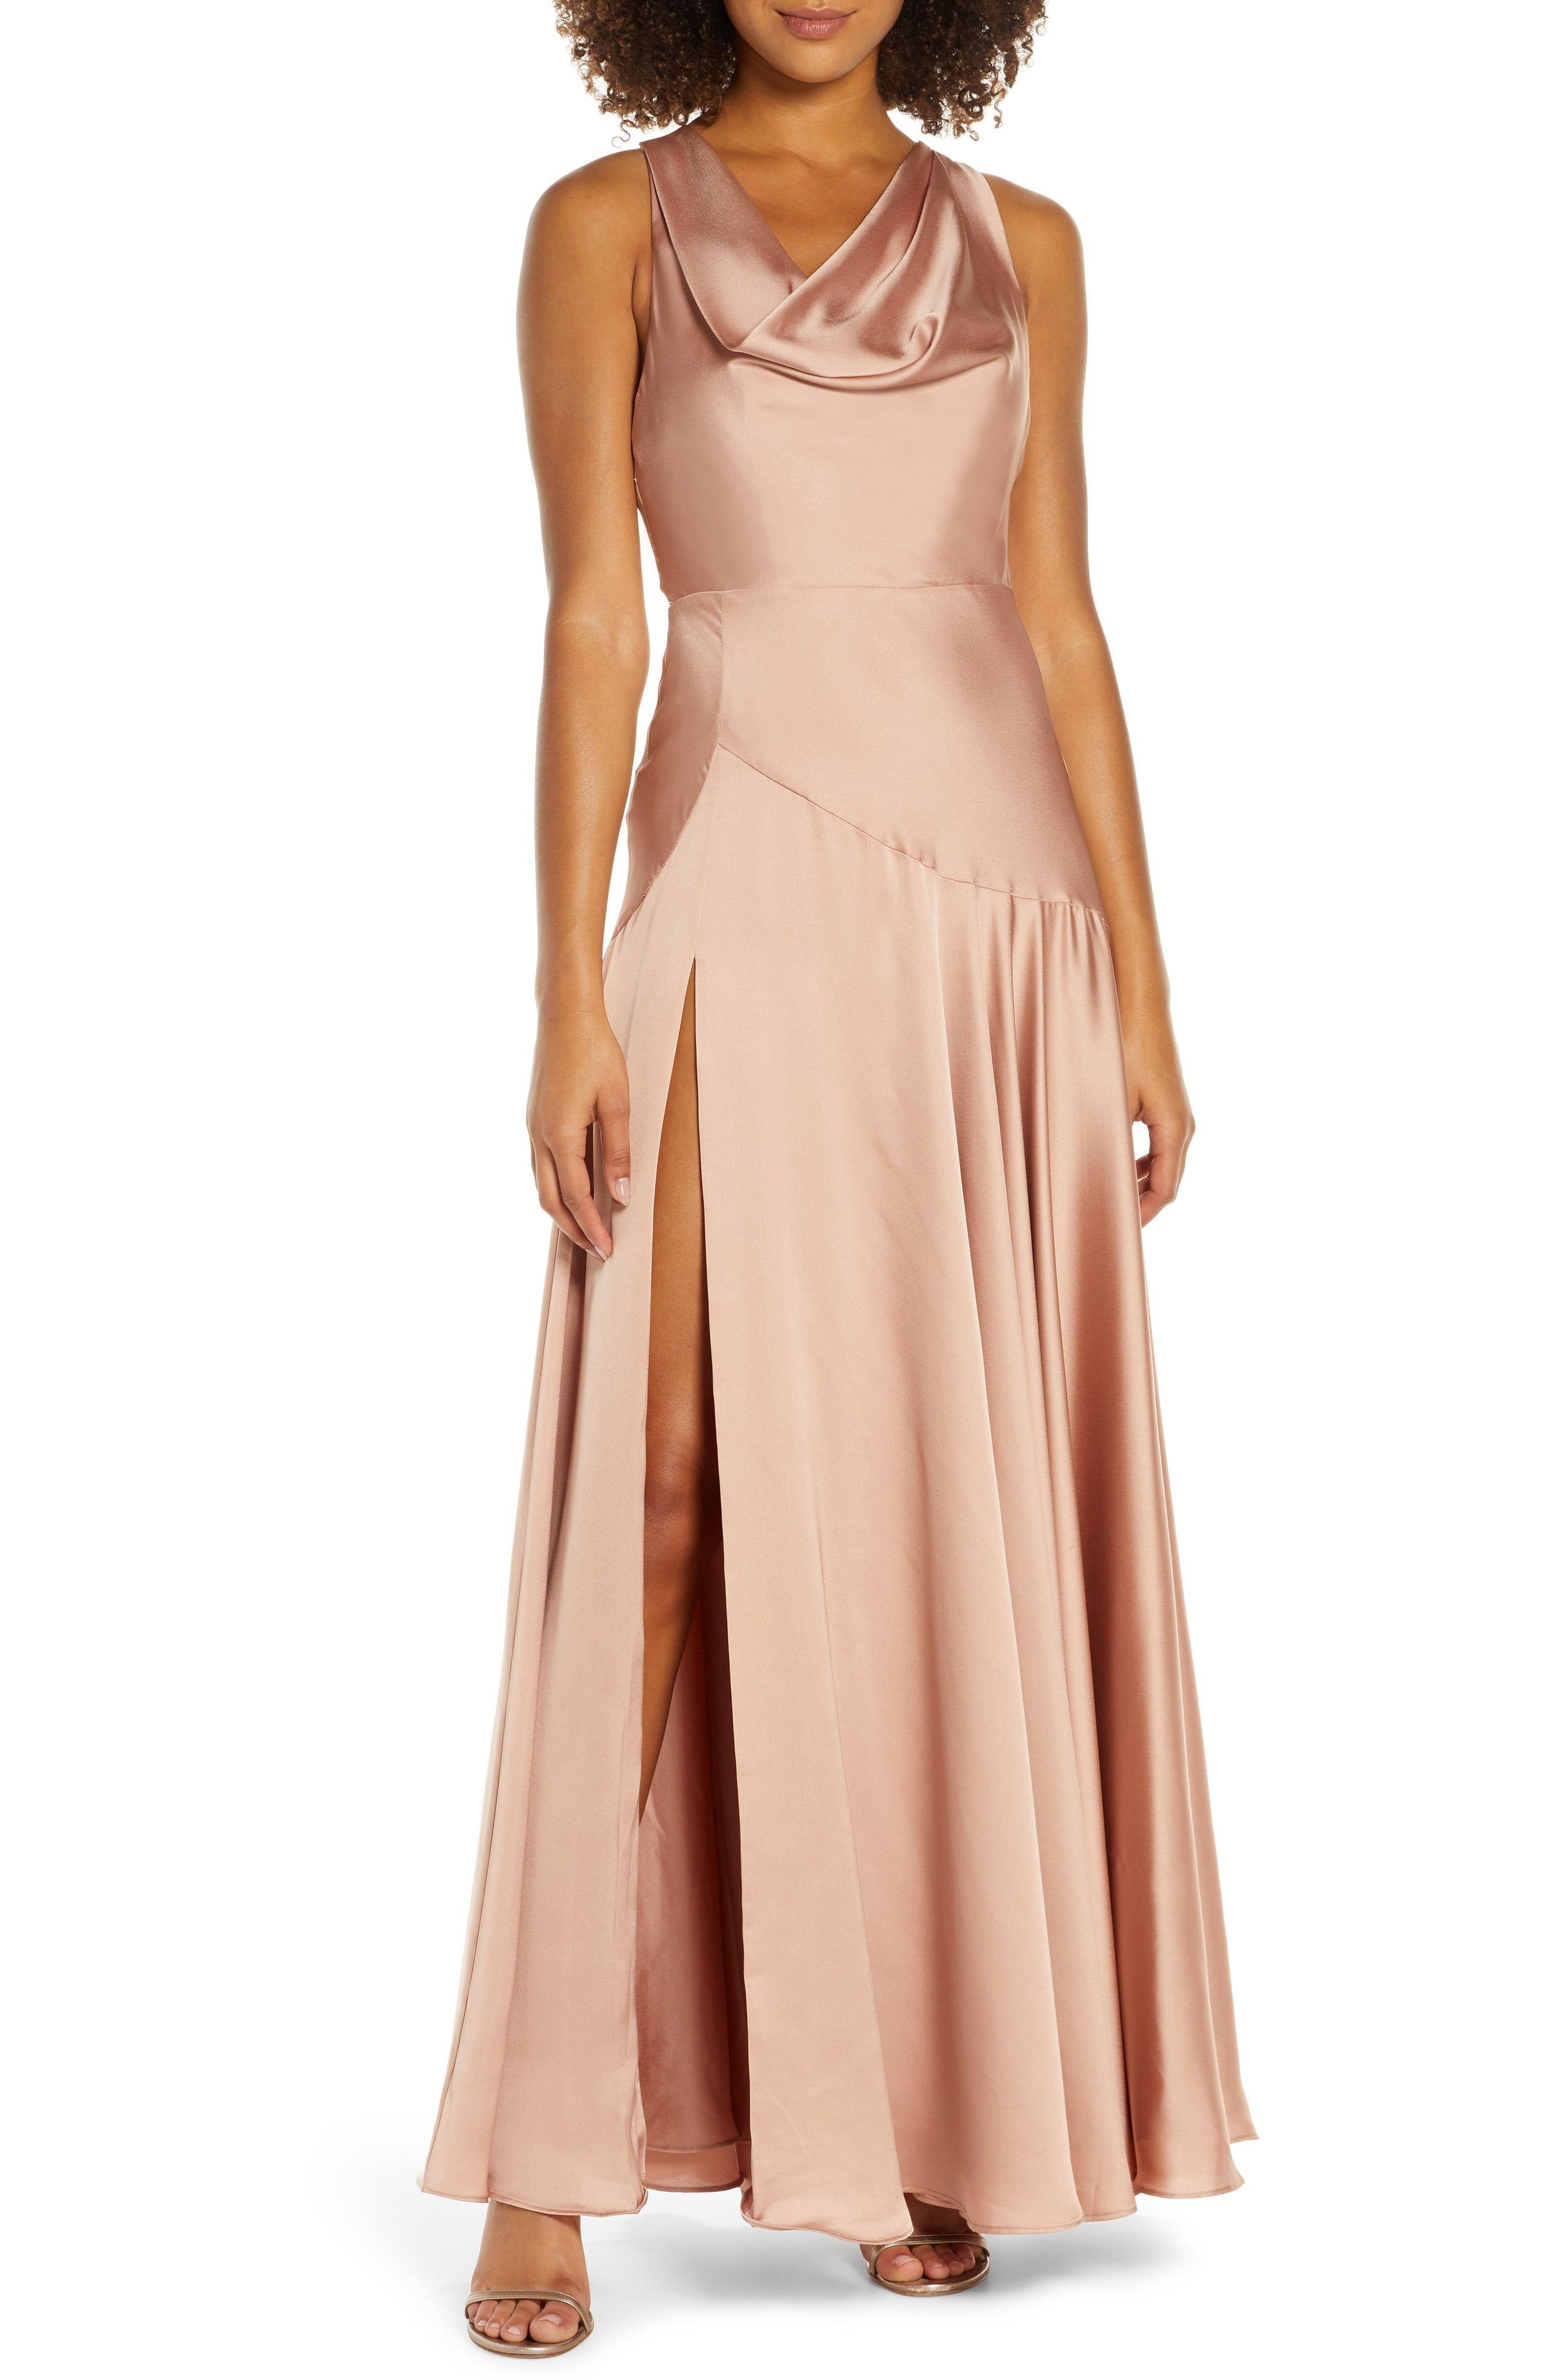 1930s Evening Dress Art Deco Gown Party Dress 1930s Dress Evening Gowns Evening Gowns [ 4048 x 2640 Pixel ]